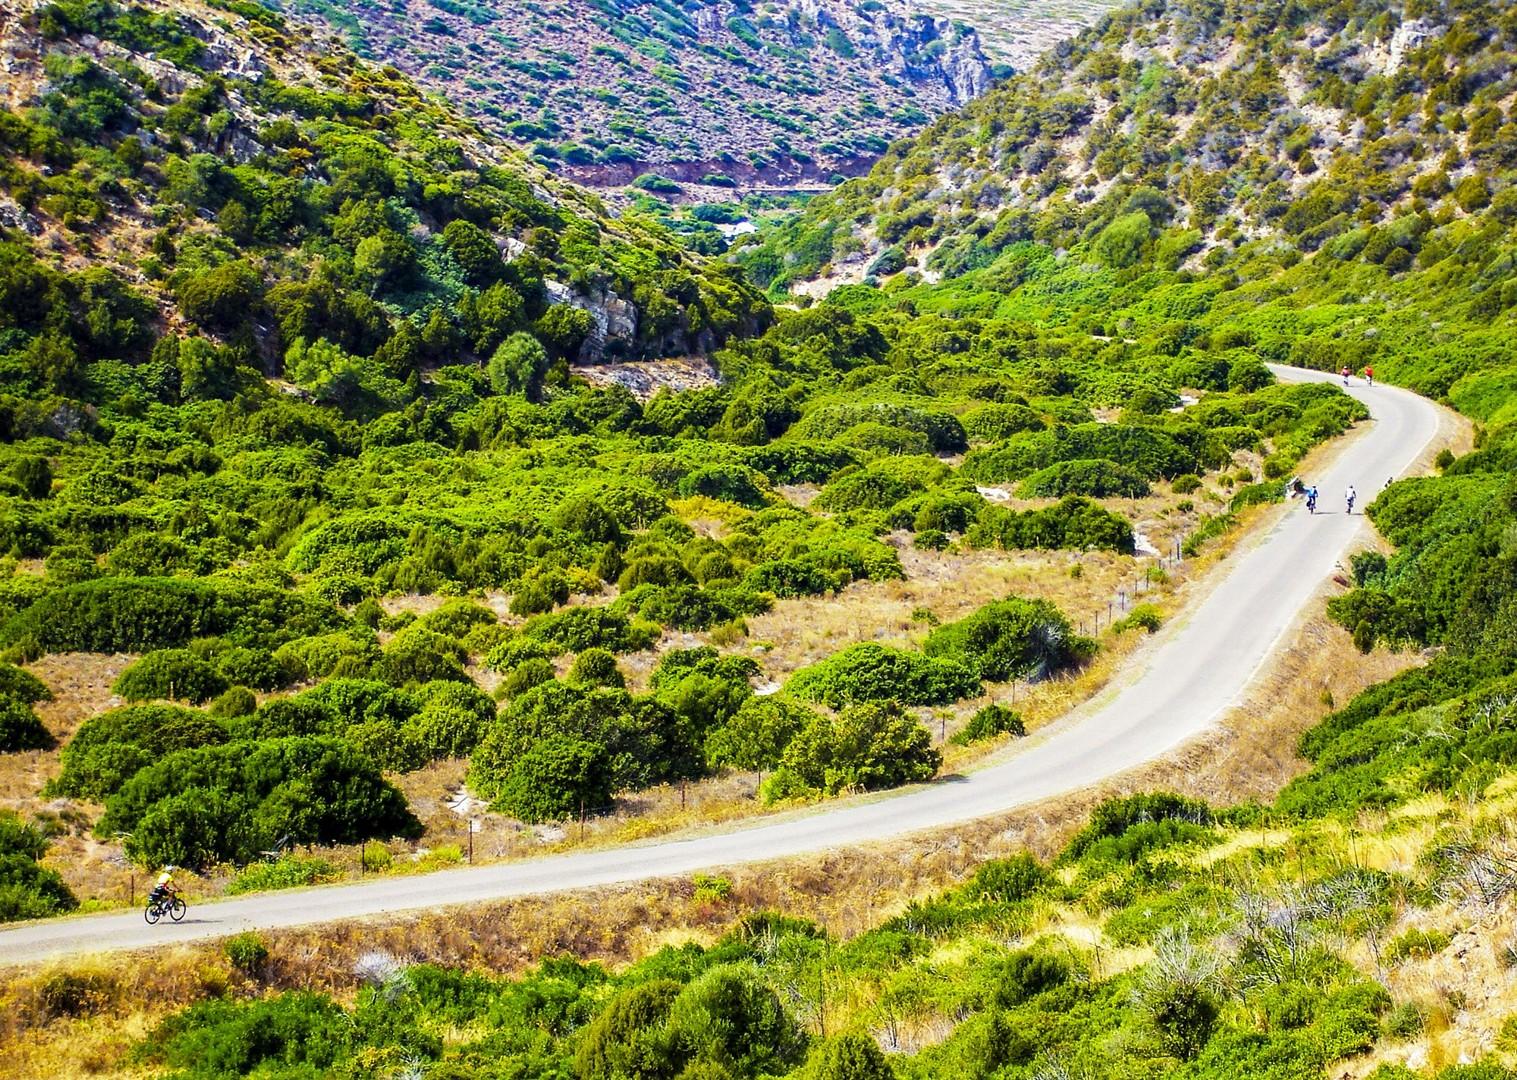 cycling-through-sardinia-italy-guided-leisure-cycling-holidays-bikes.jpg - Italy - Sardinia - Island Flavours - Guided Leisure Cycling Holiday - Italia Leisure and Family Cycling